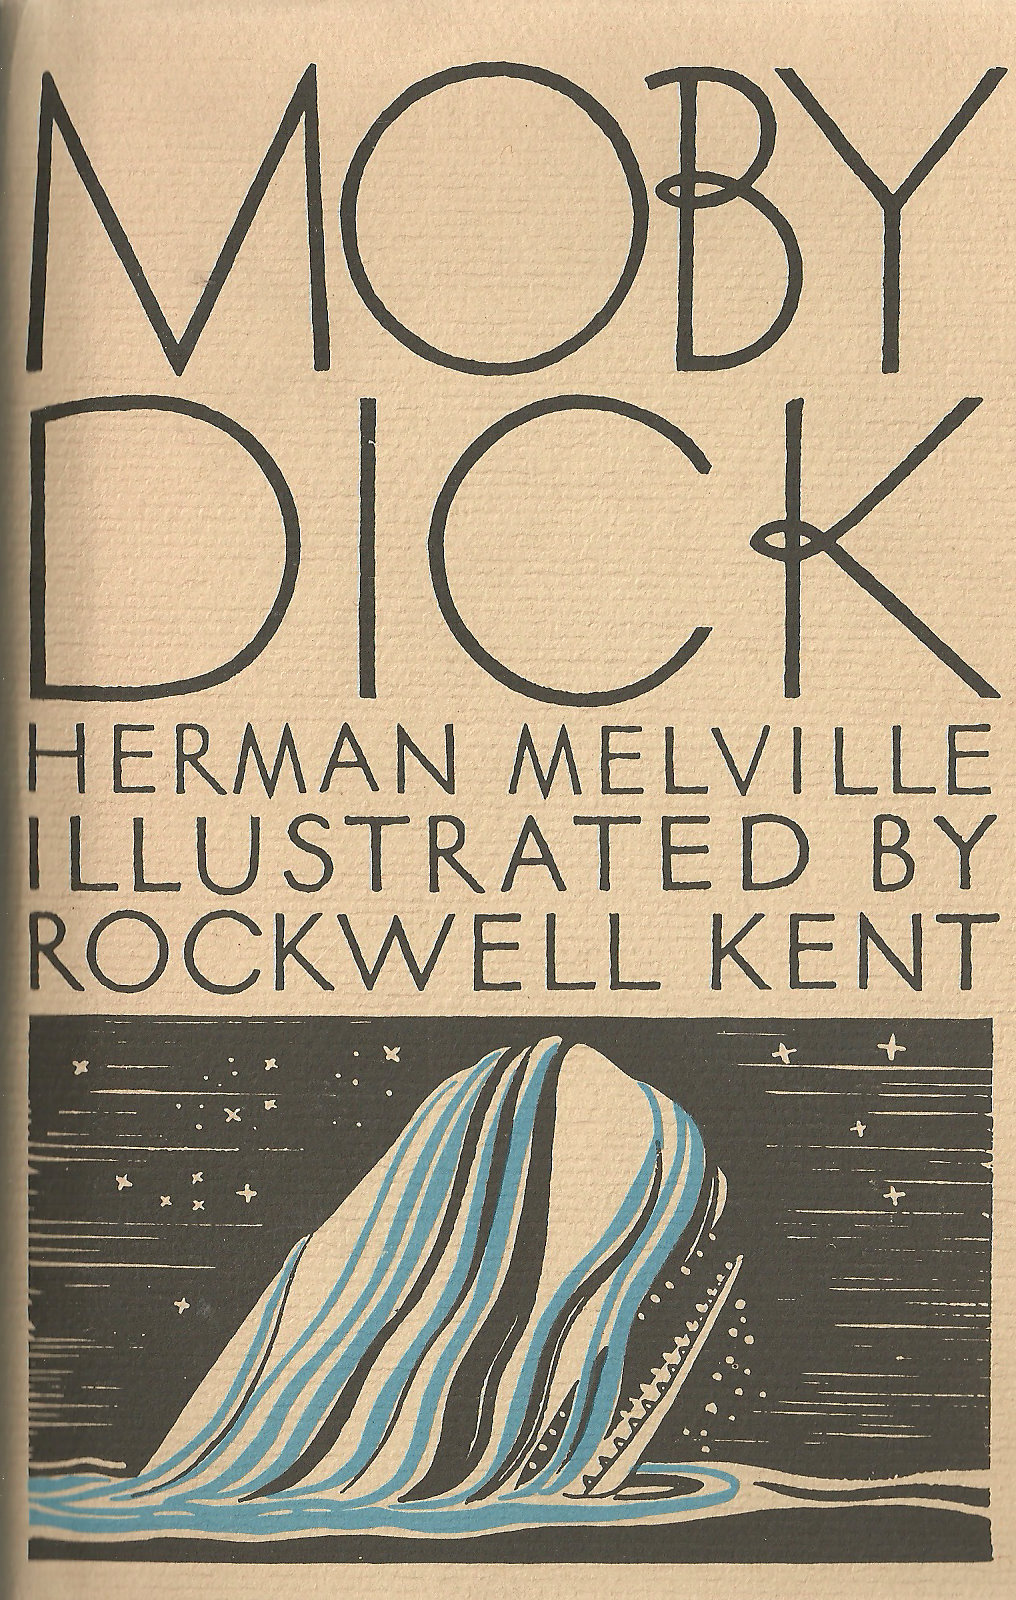 Before Goodreads, there was Art Garfunkel — Matthew Dicks